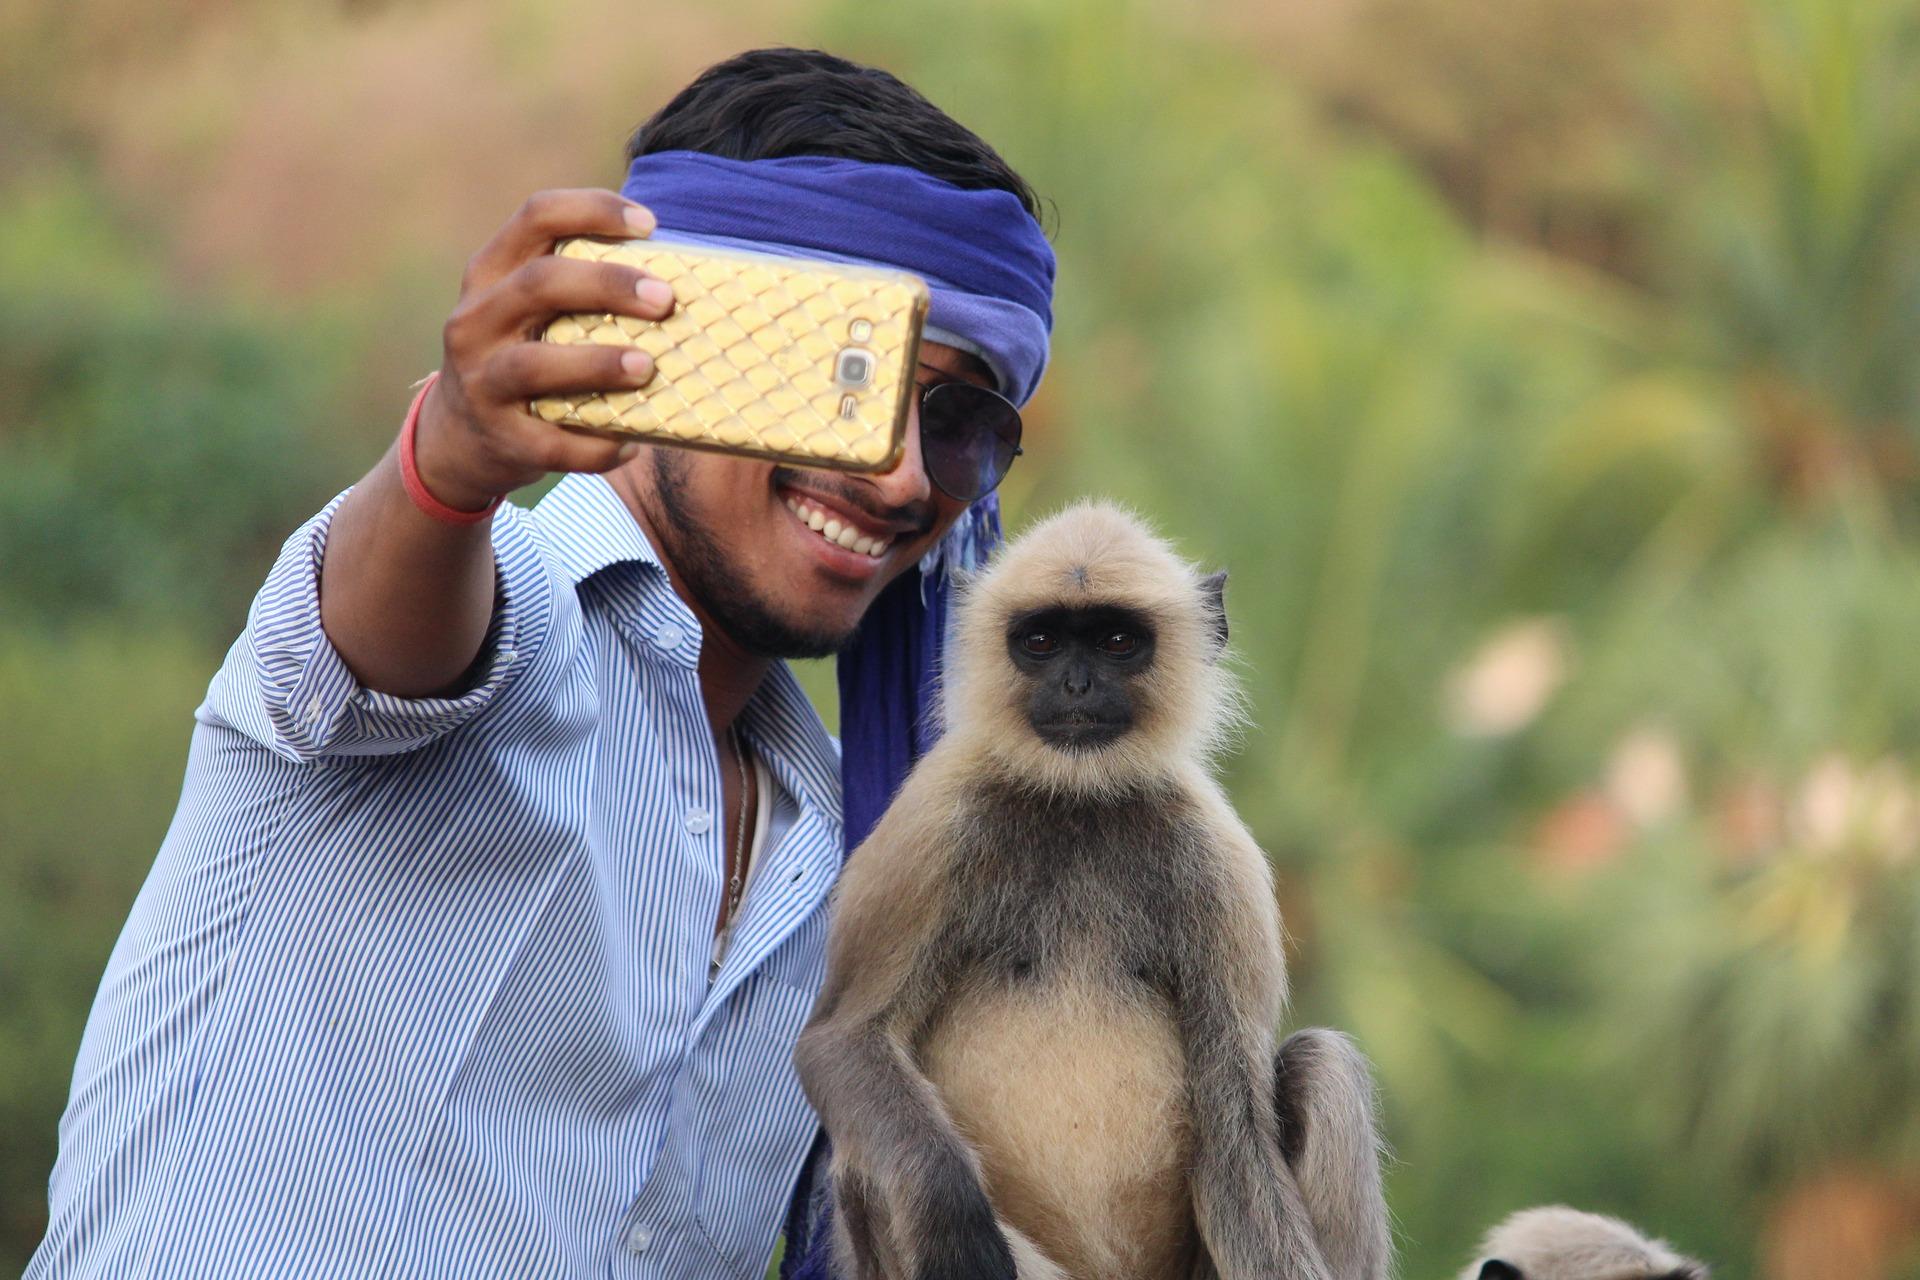 Selfie with monkey